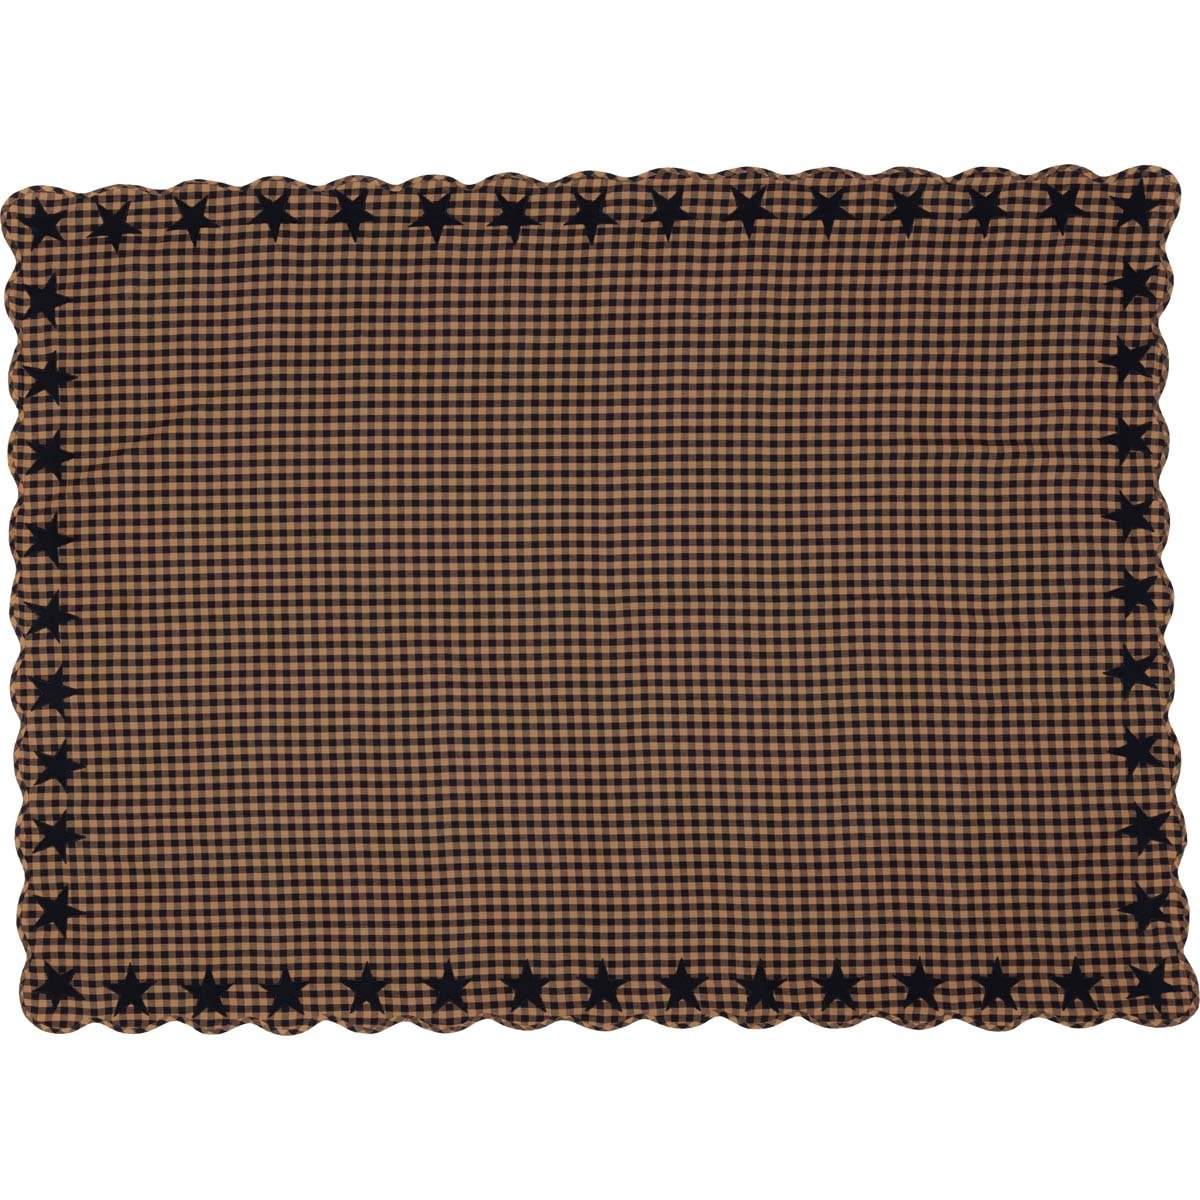 4 Mil AAMV44100-BX PMF Medium Box of 200 Clear Industrial AMMEX Vinyl Gloves Anti-Microbial,Powder Free,Food Safe